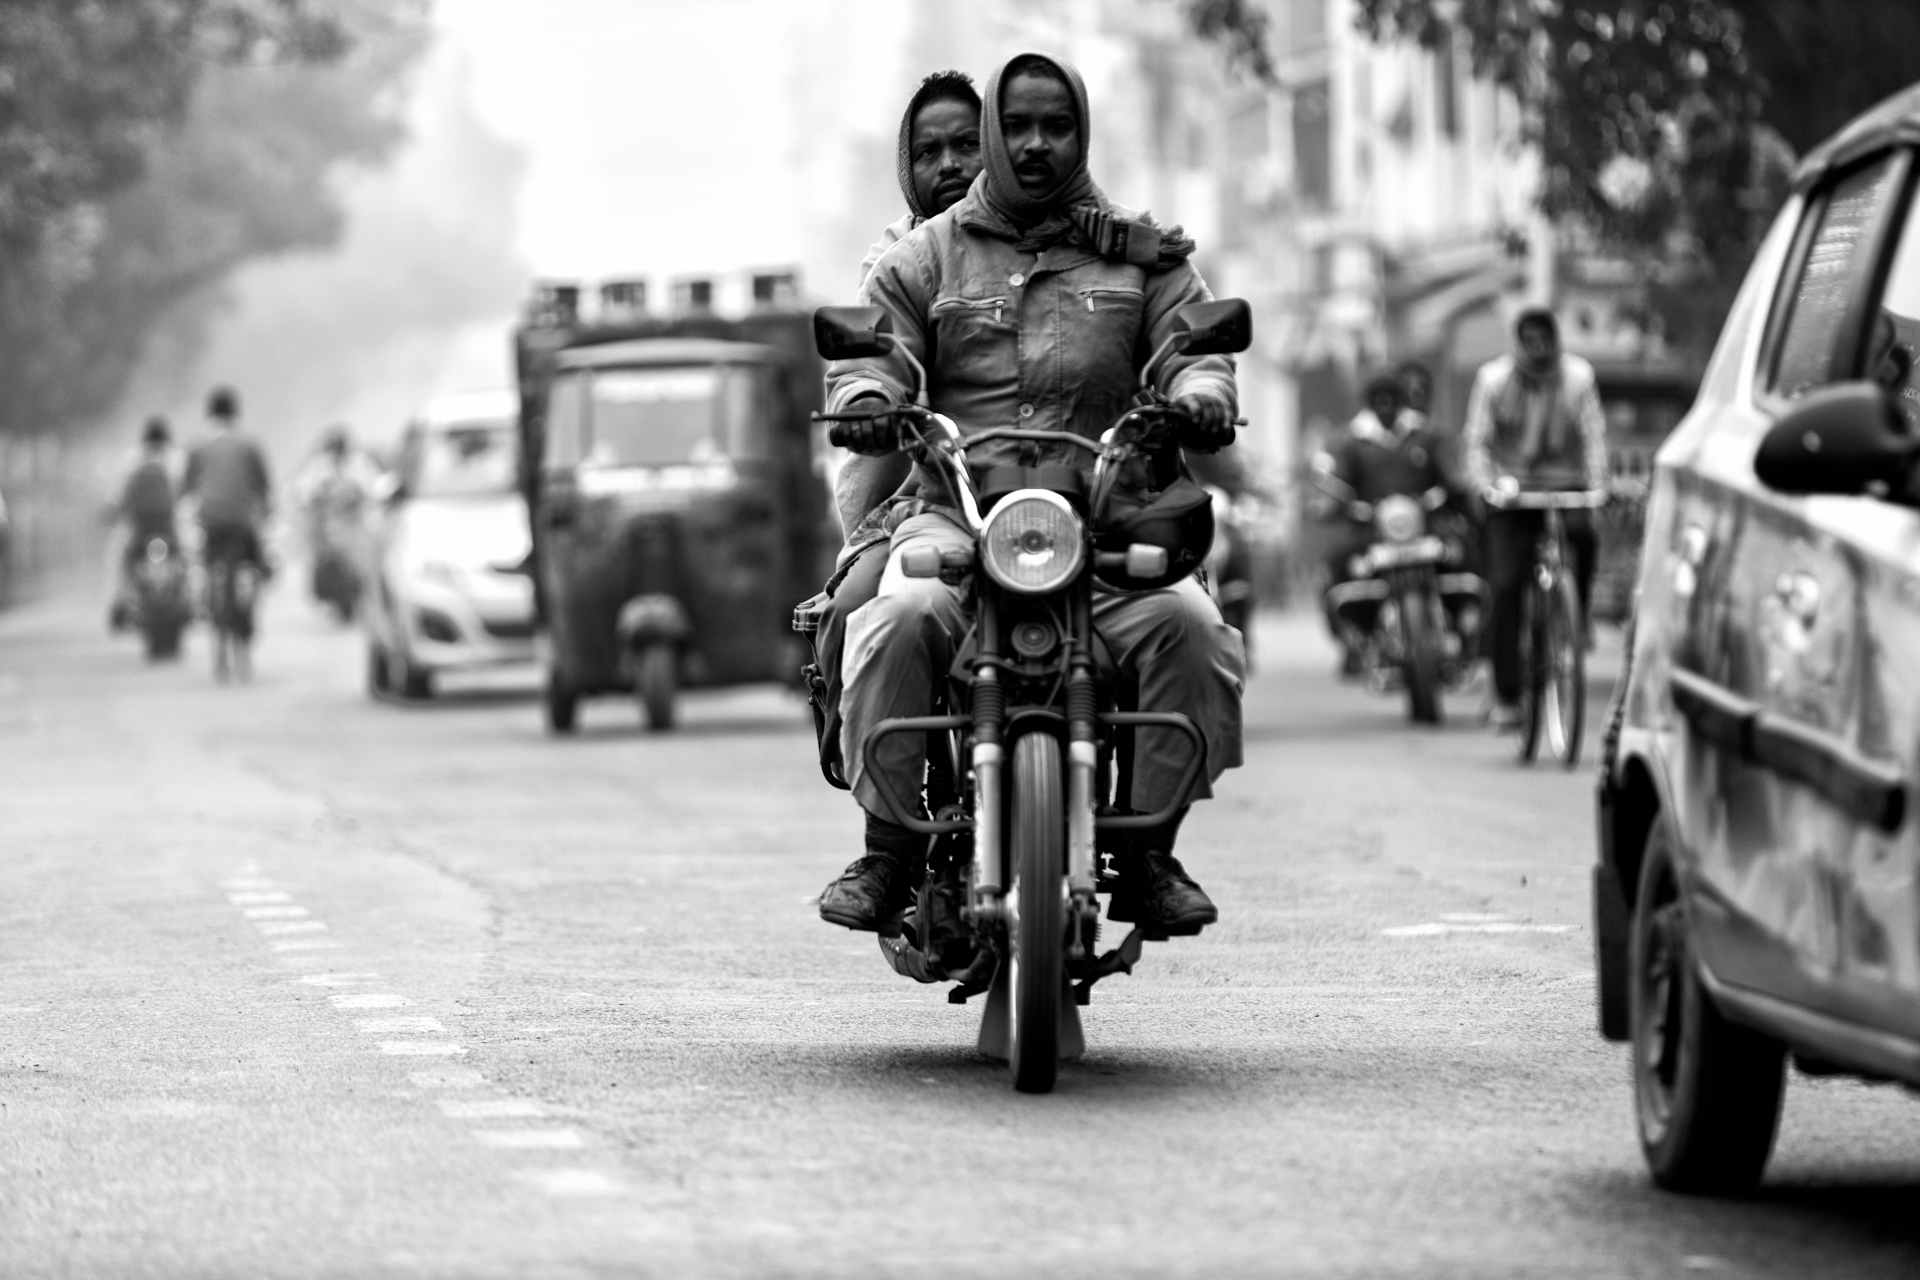 India-moto-black&white